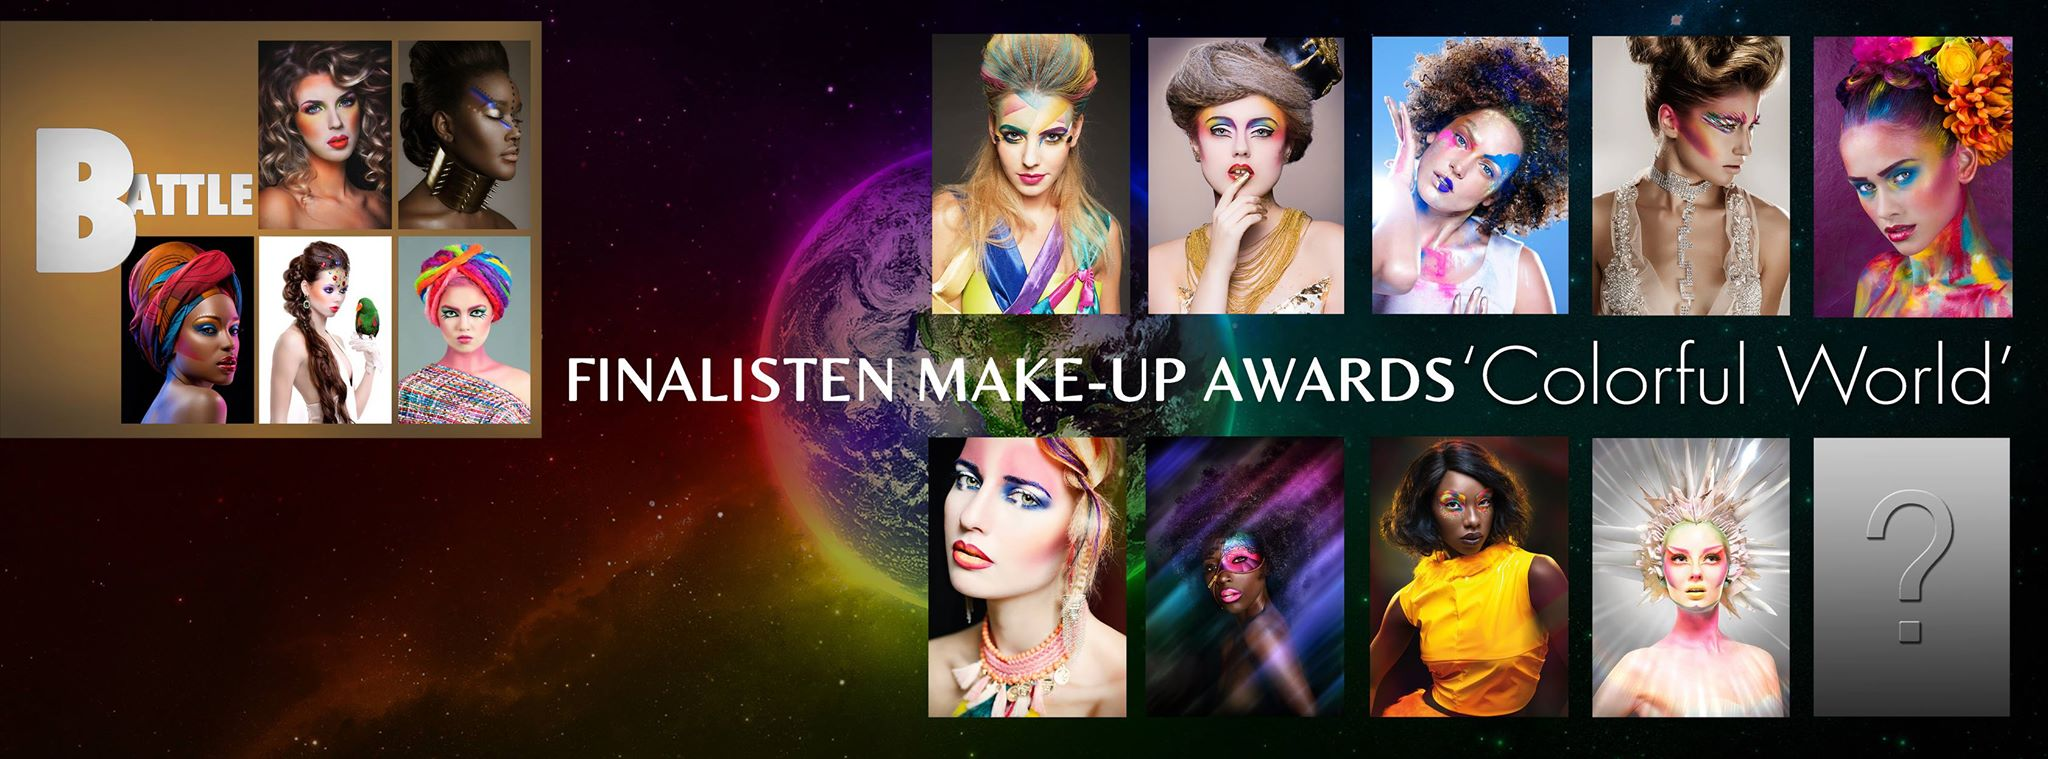 Make up Awards fotoshoot